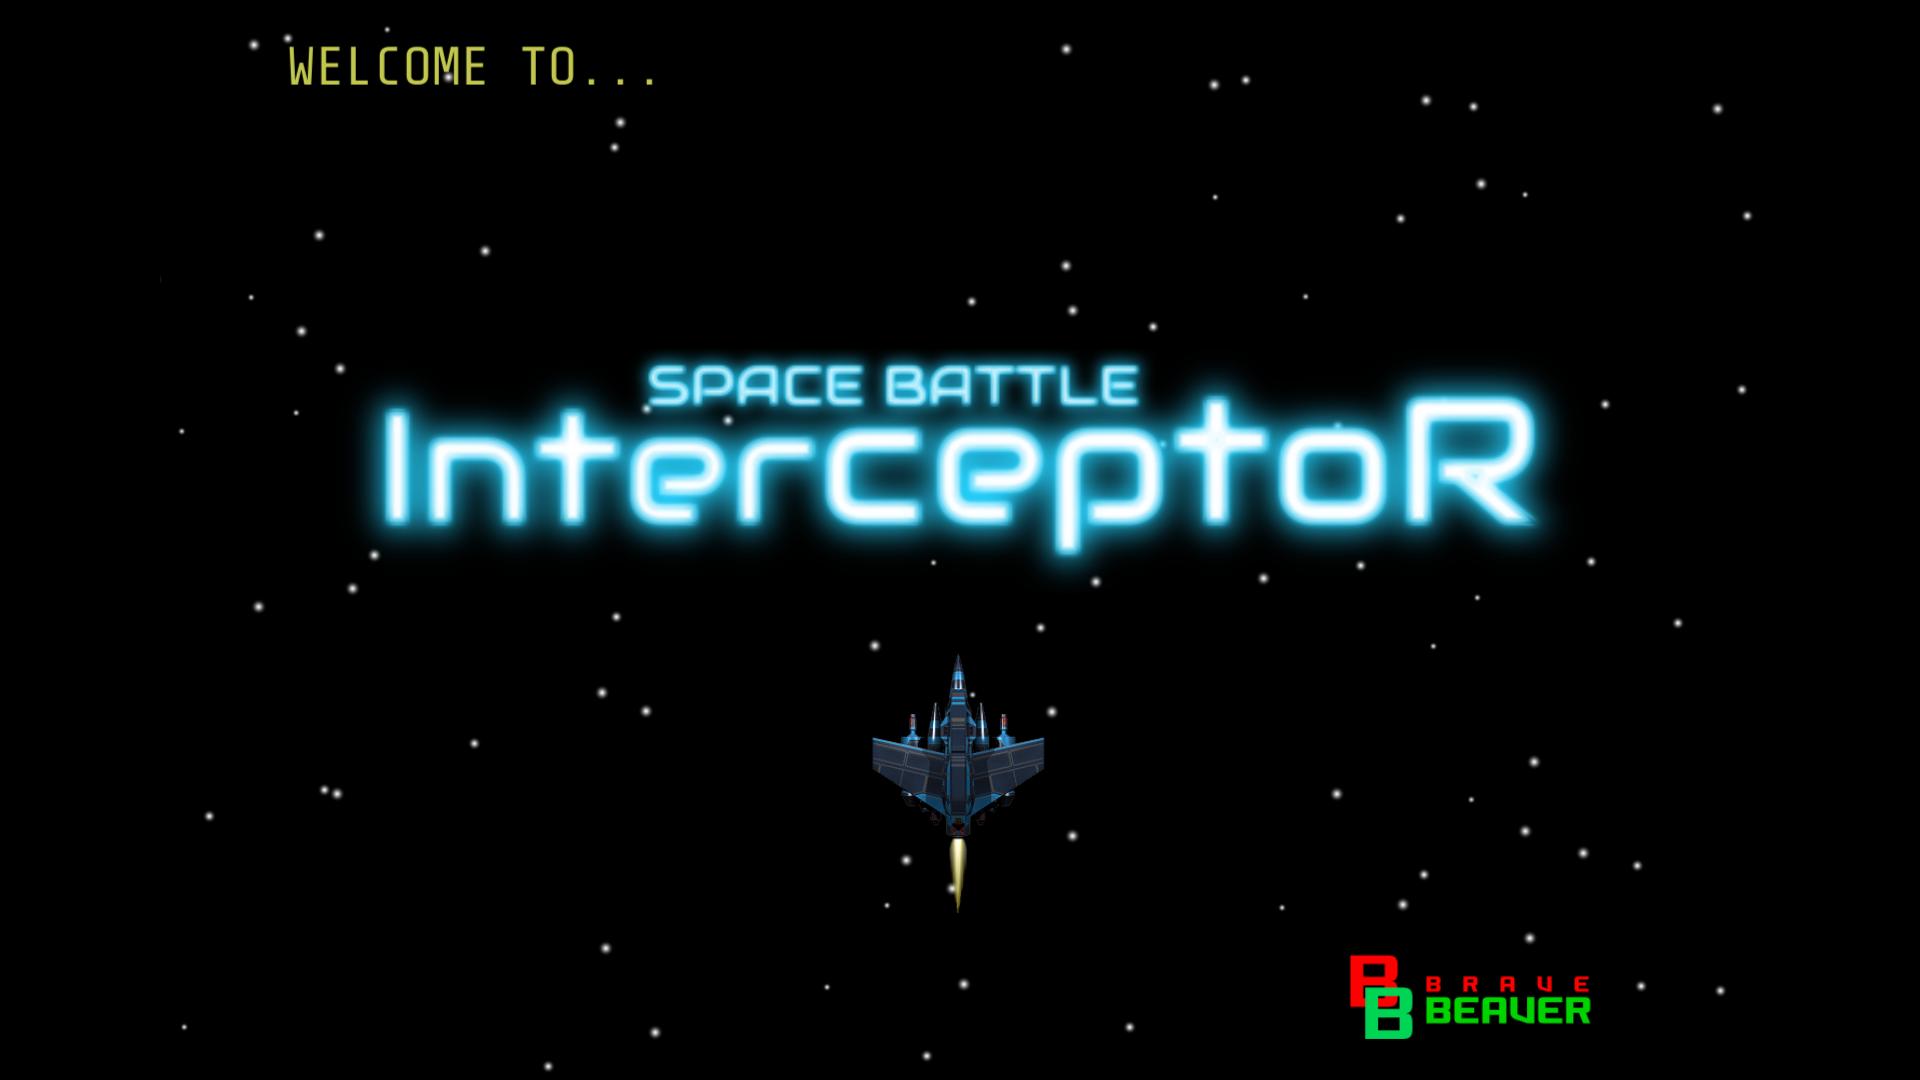 Space Battle: Interceptor